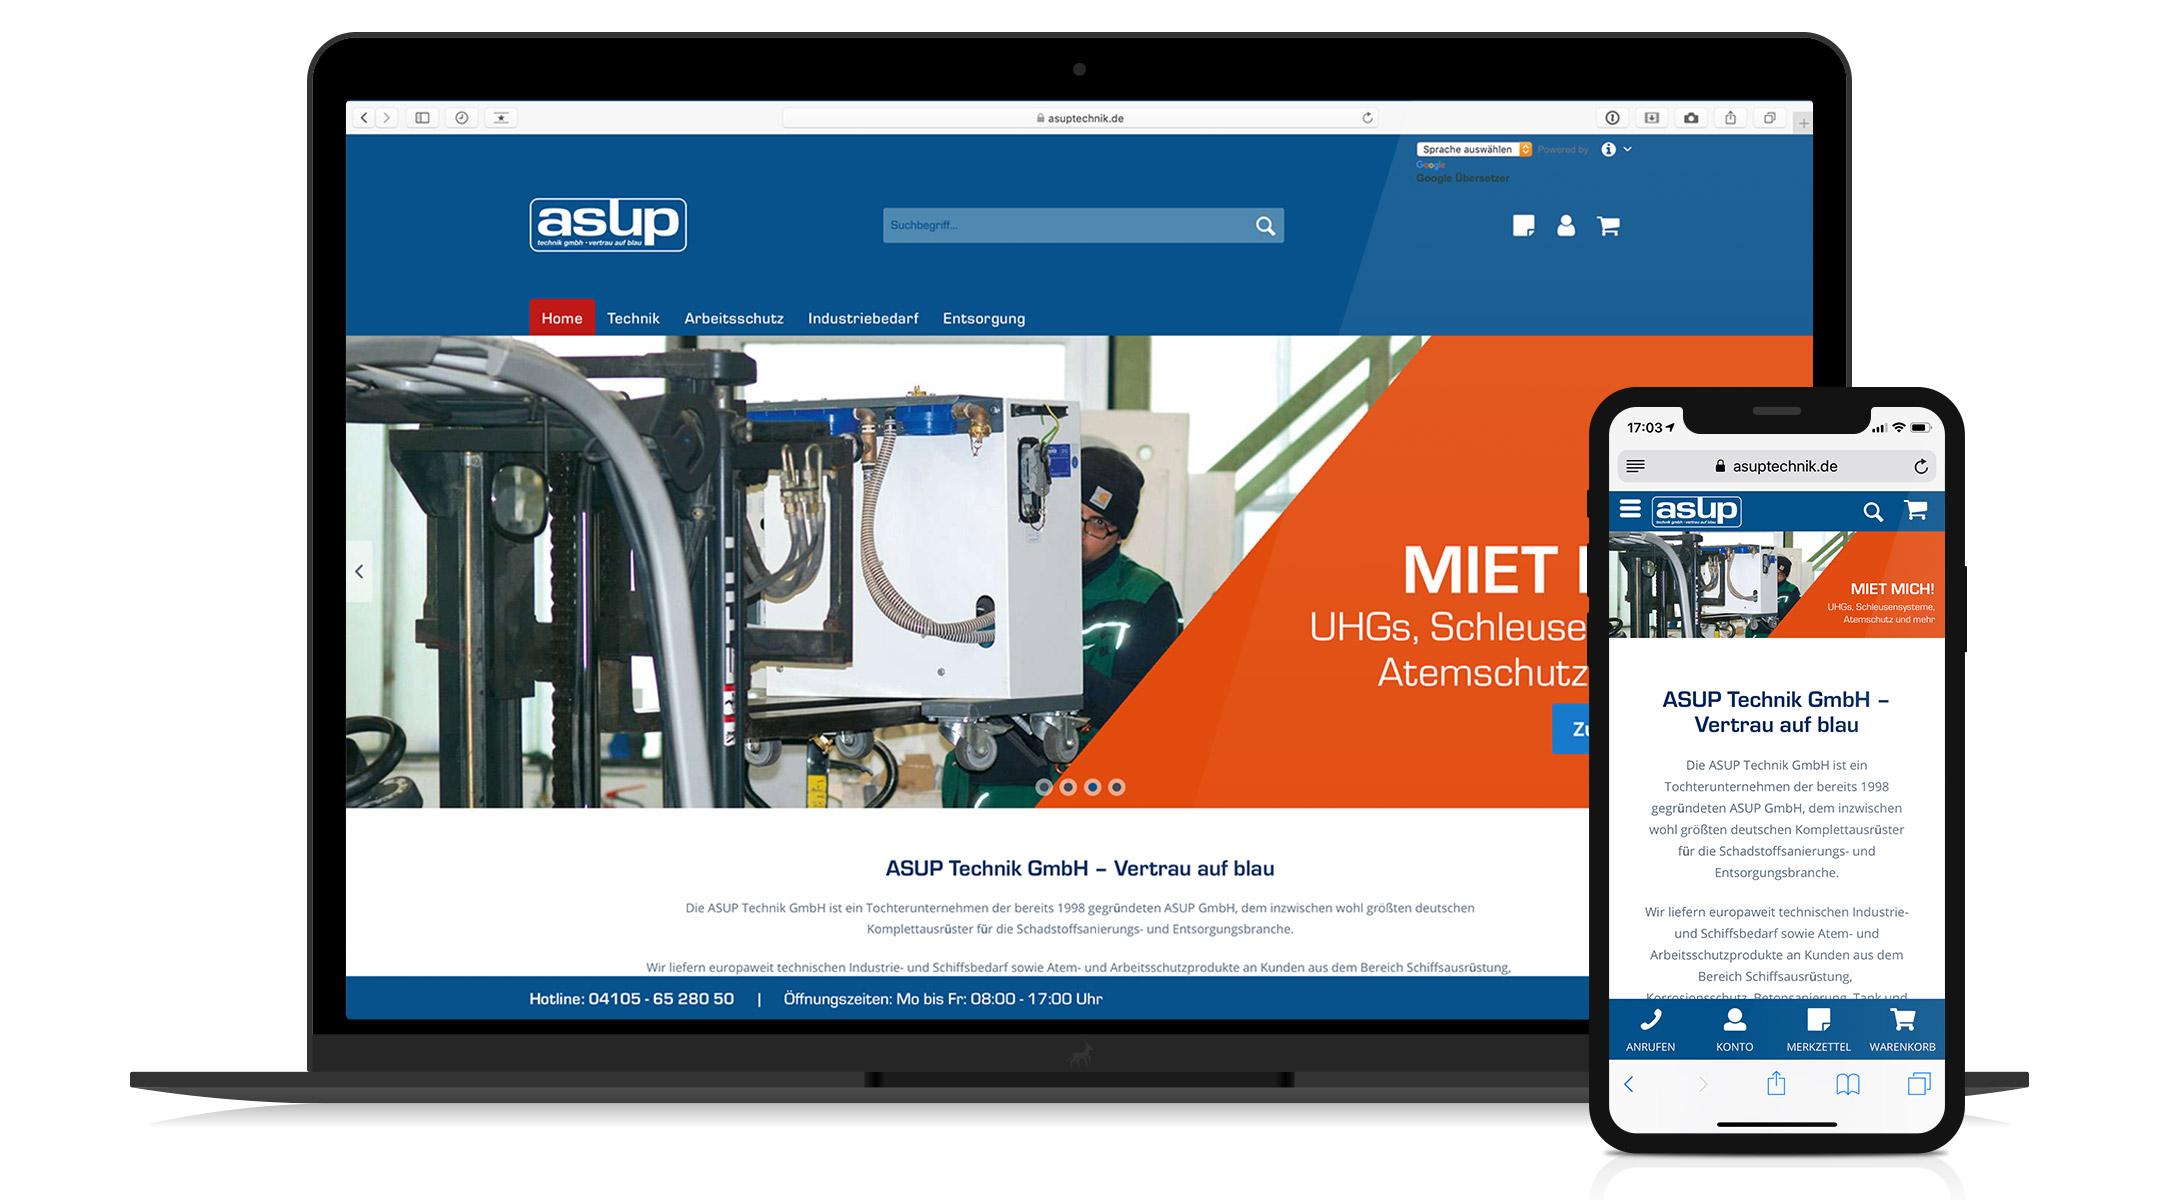 asup-Webshop_5